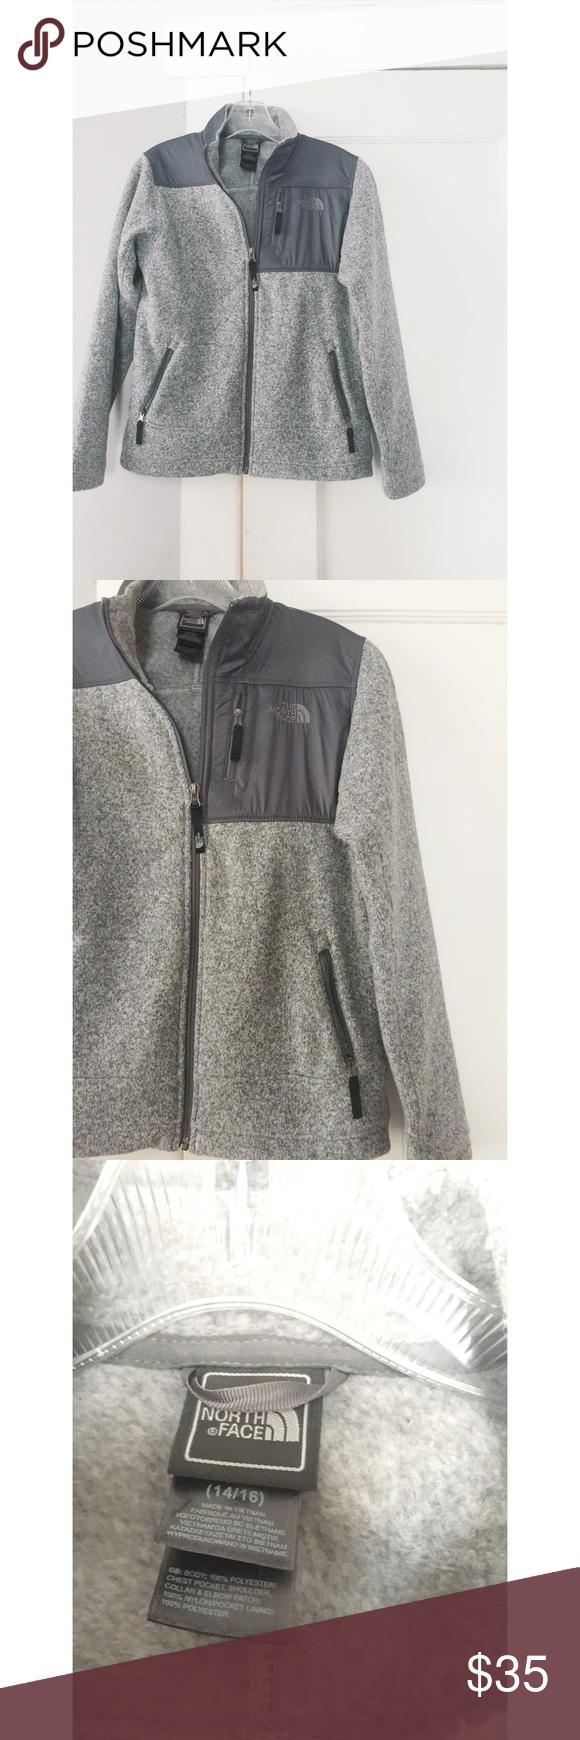 Host pick the north face fleece jacket north face fleece